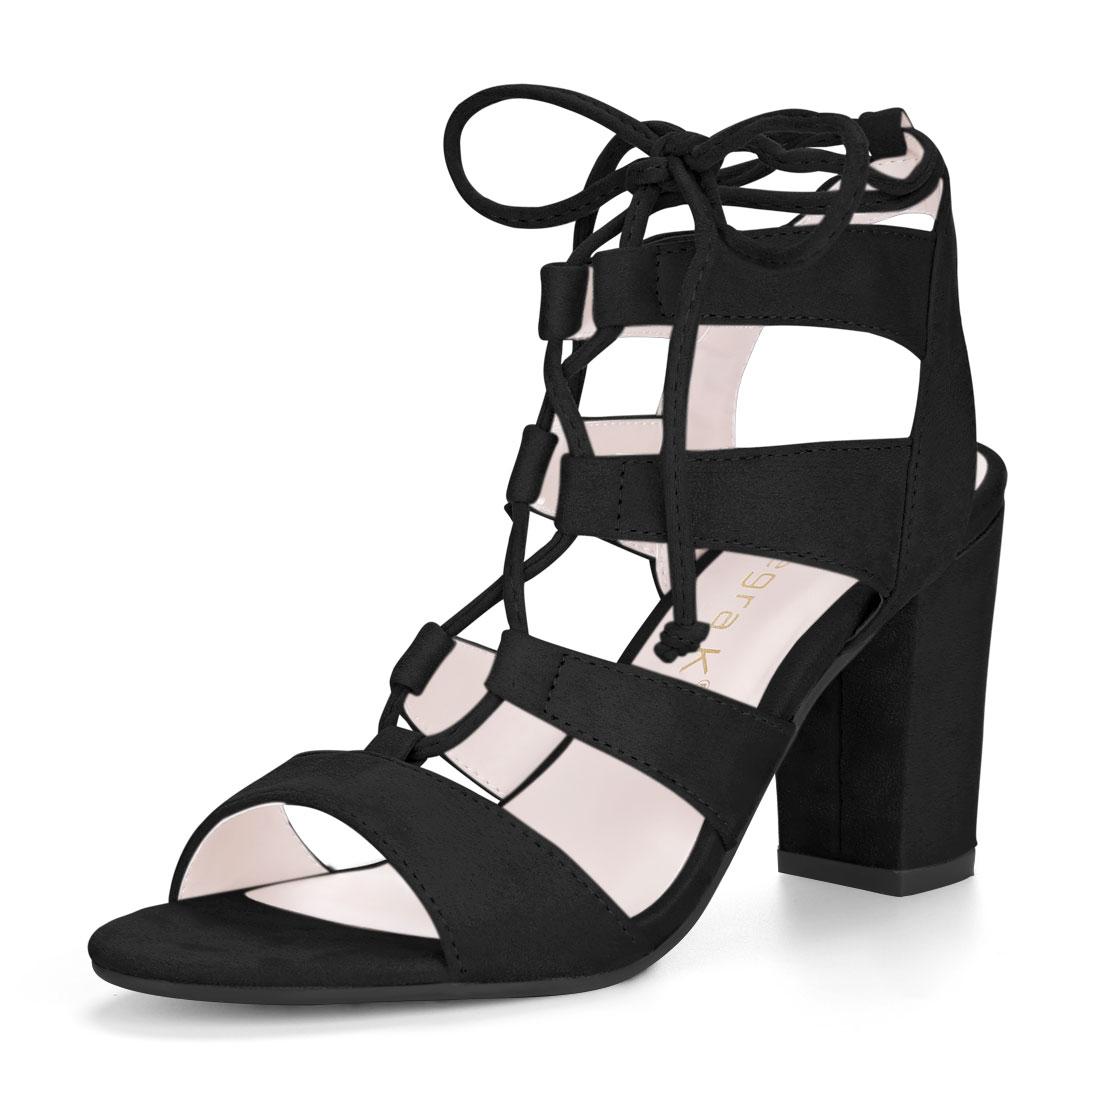 Allegra K Women's Tie Up Strappy Gladiator Block Heel Sandals Black US 6.5